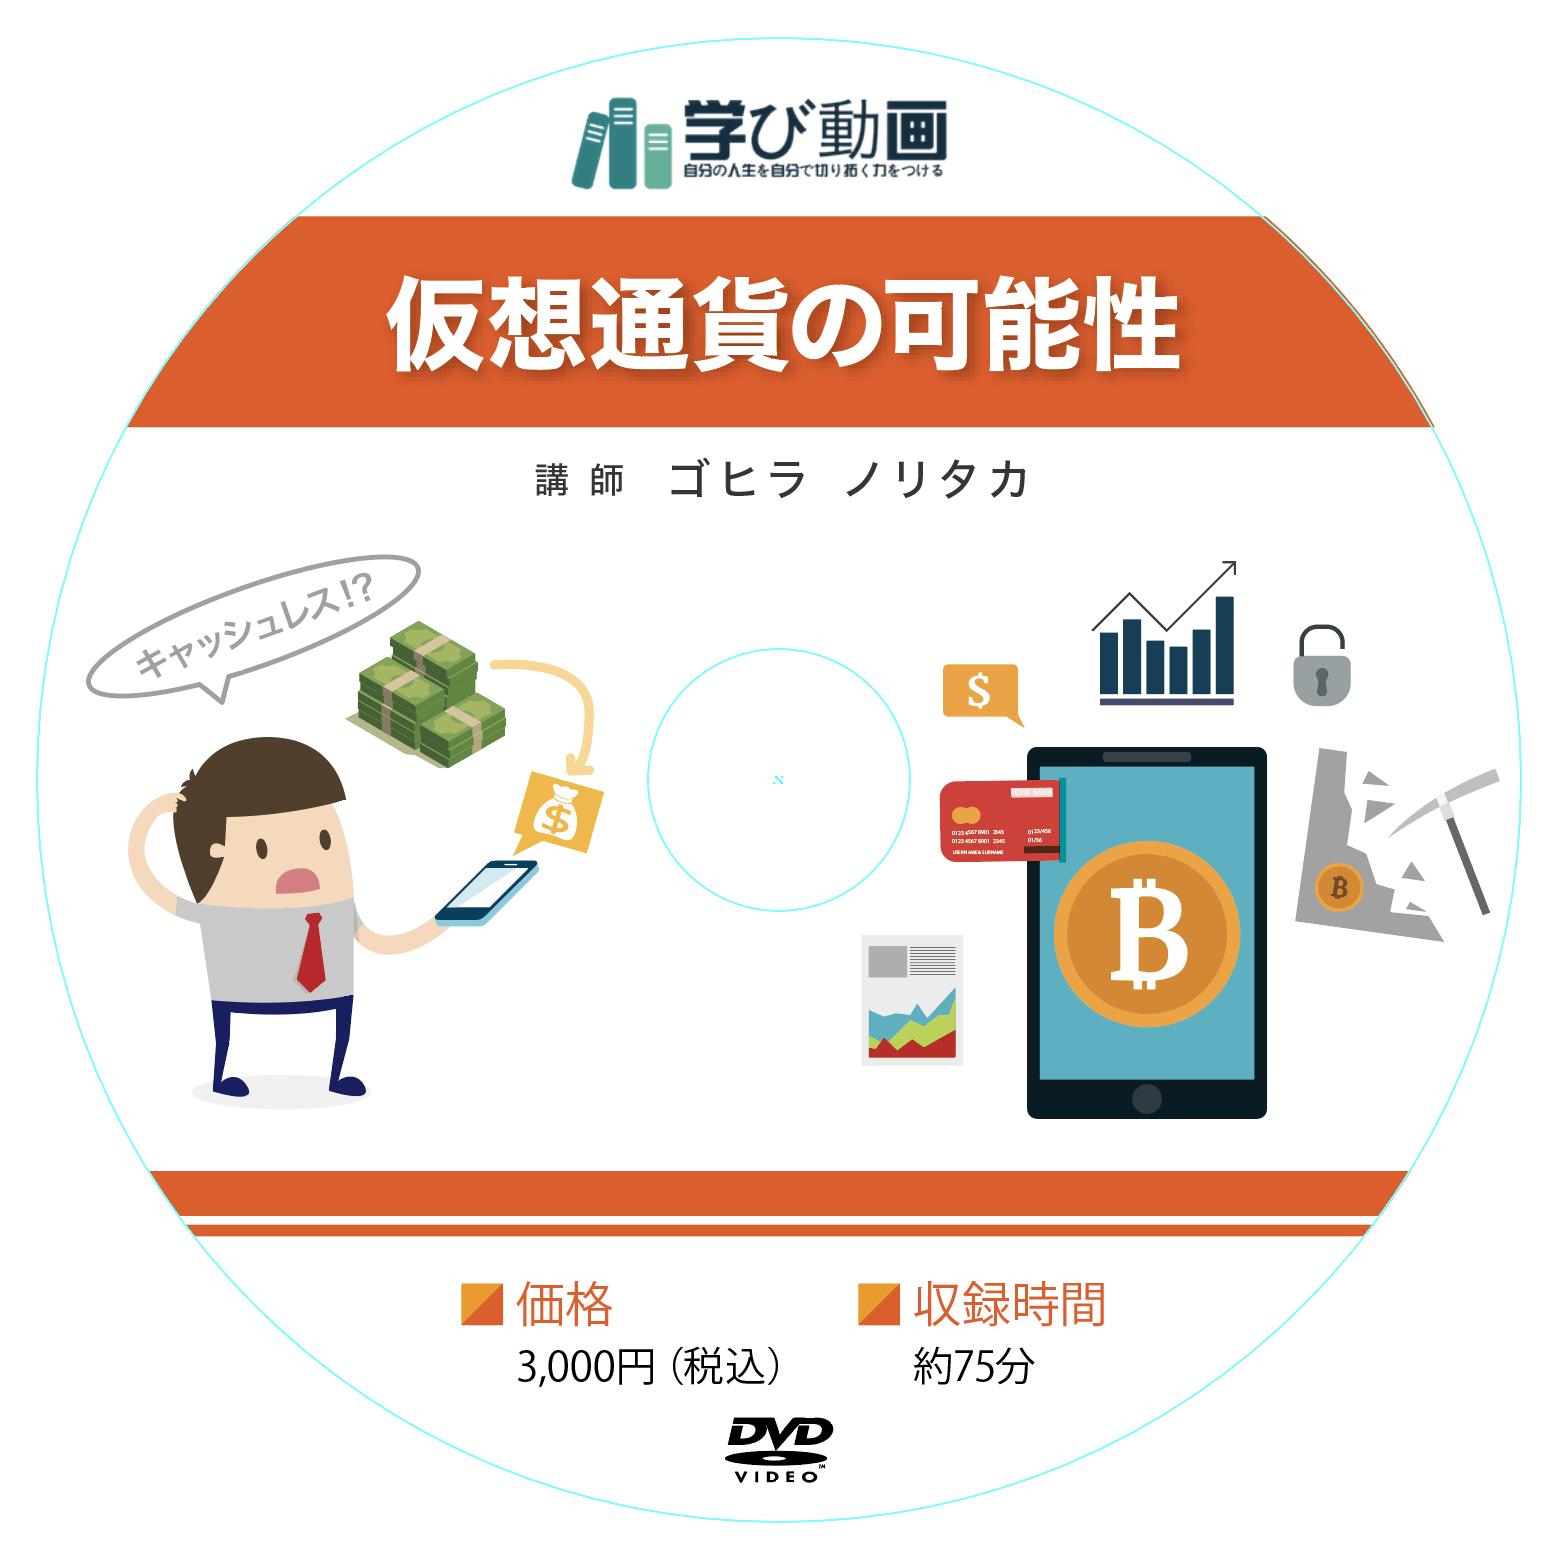 【WEB視聴版】仮想通貨の可能性 講師:ゴヒラノリタカ